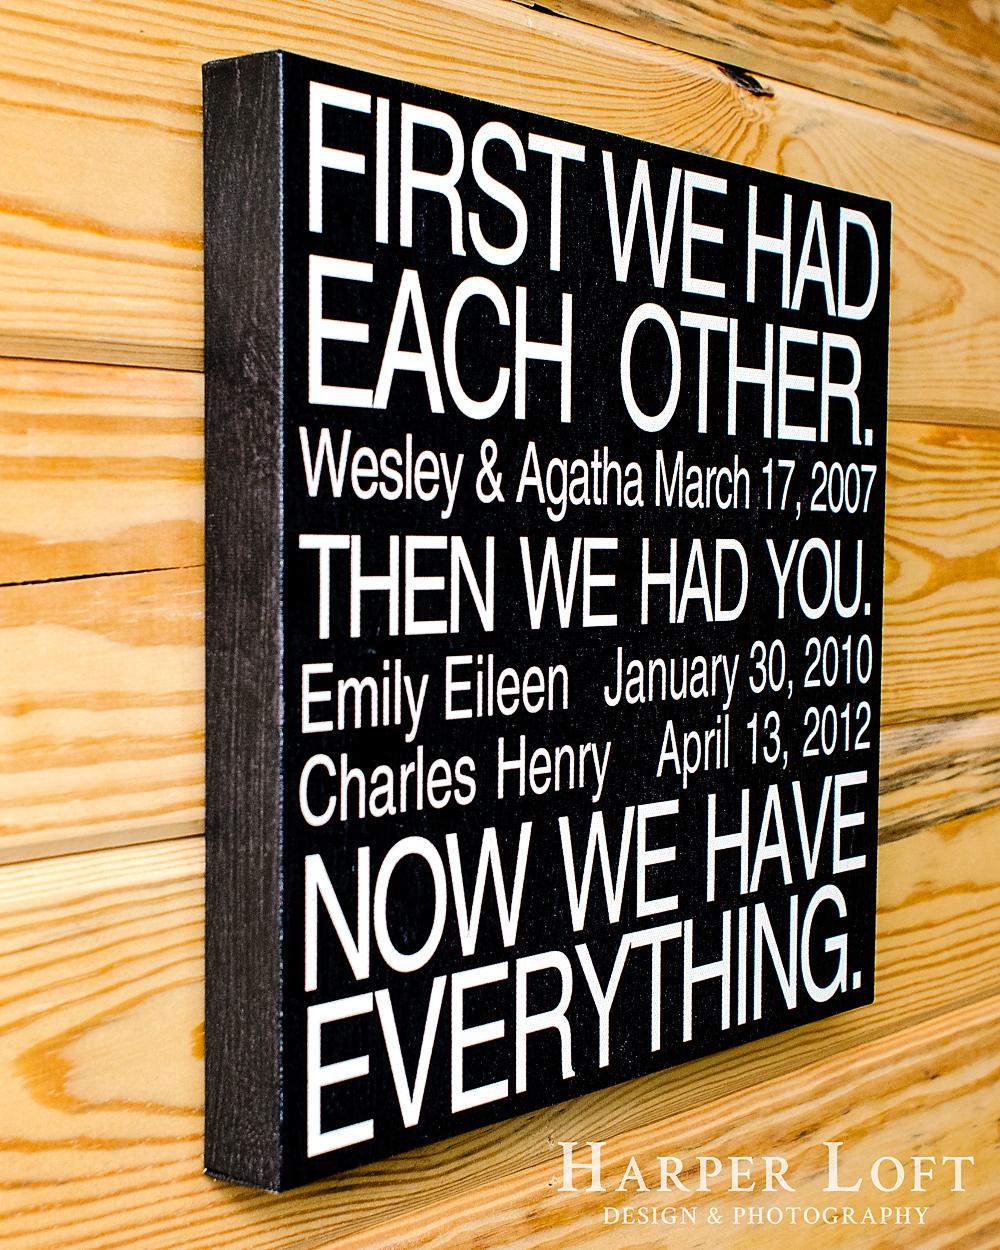 art-print-now-we-have-everything.jpg